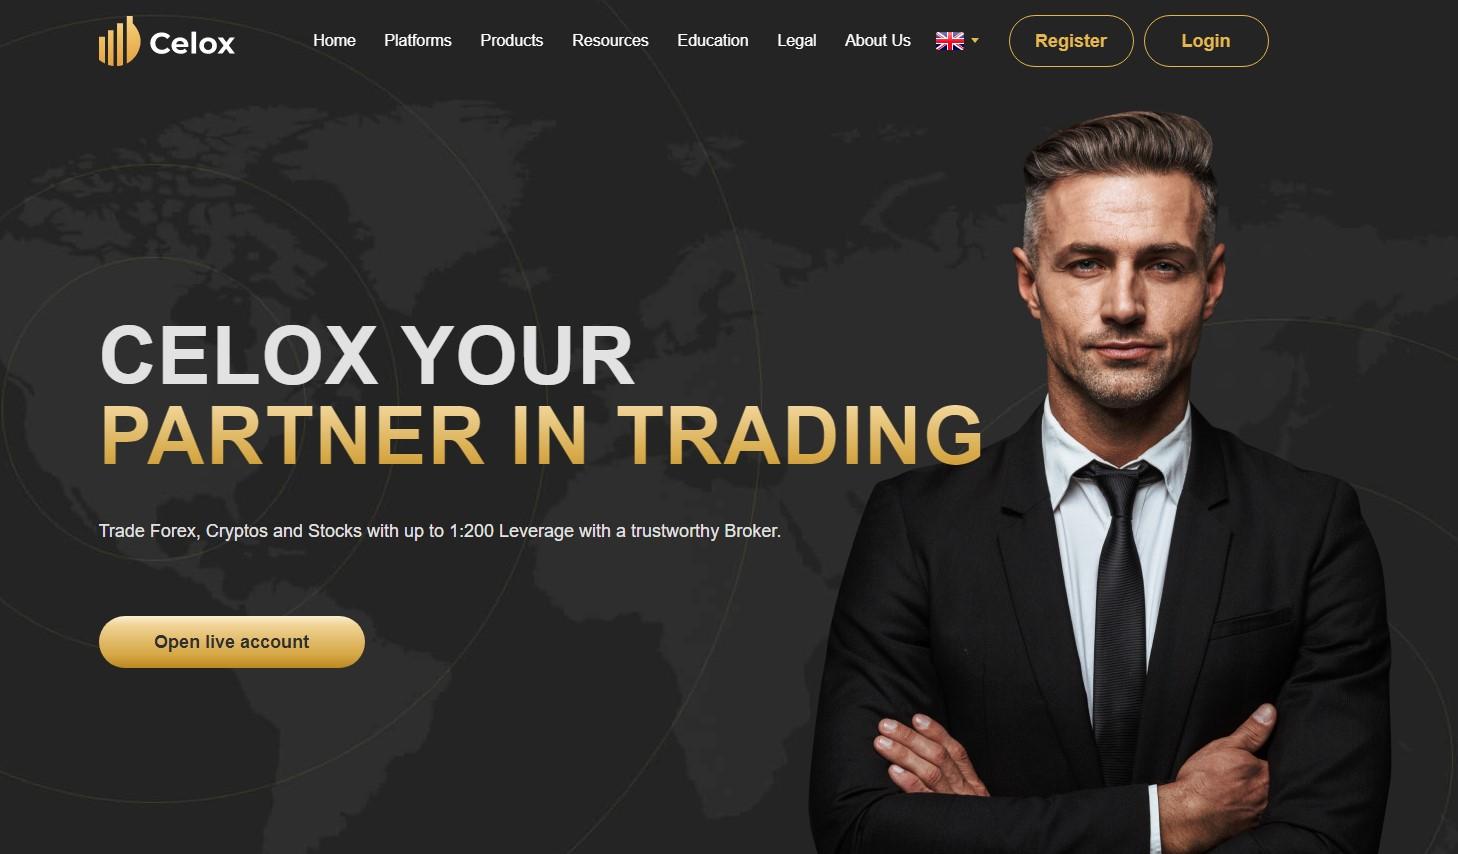 celox forex broker